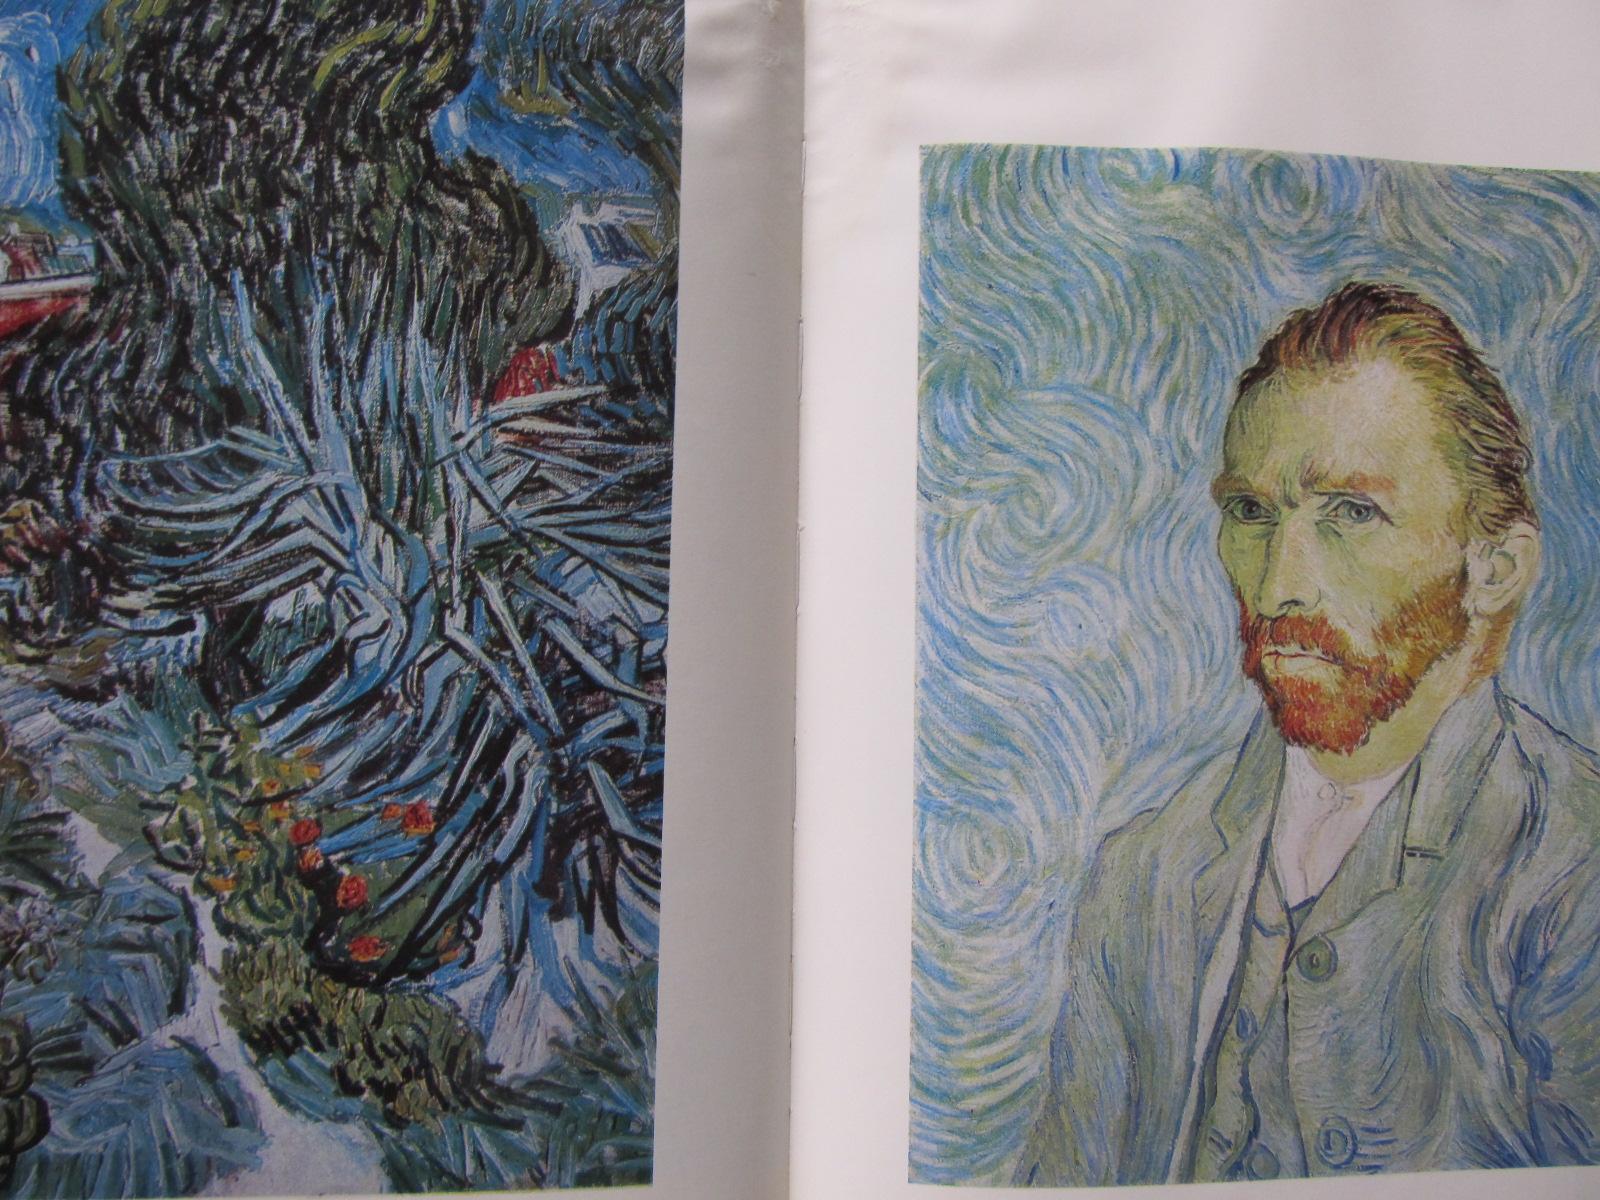 Carte Van Gogh (Album) - format foarte mare - Viorica Guy Marcia